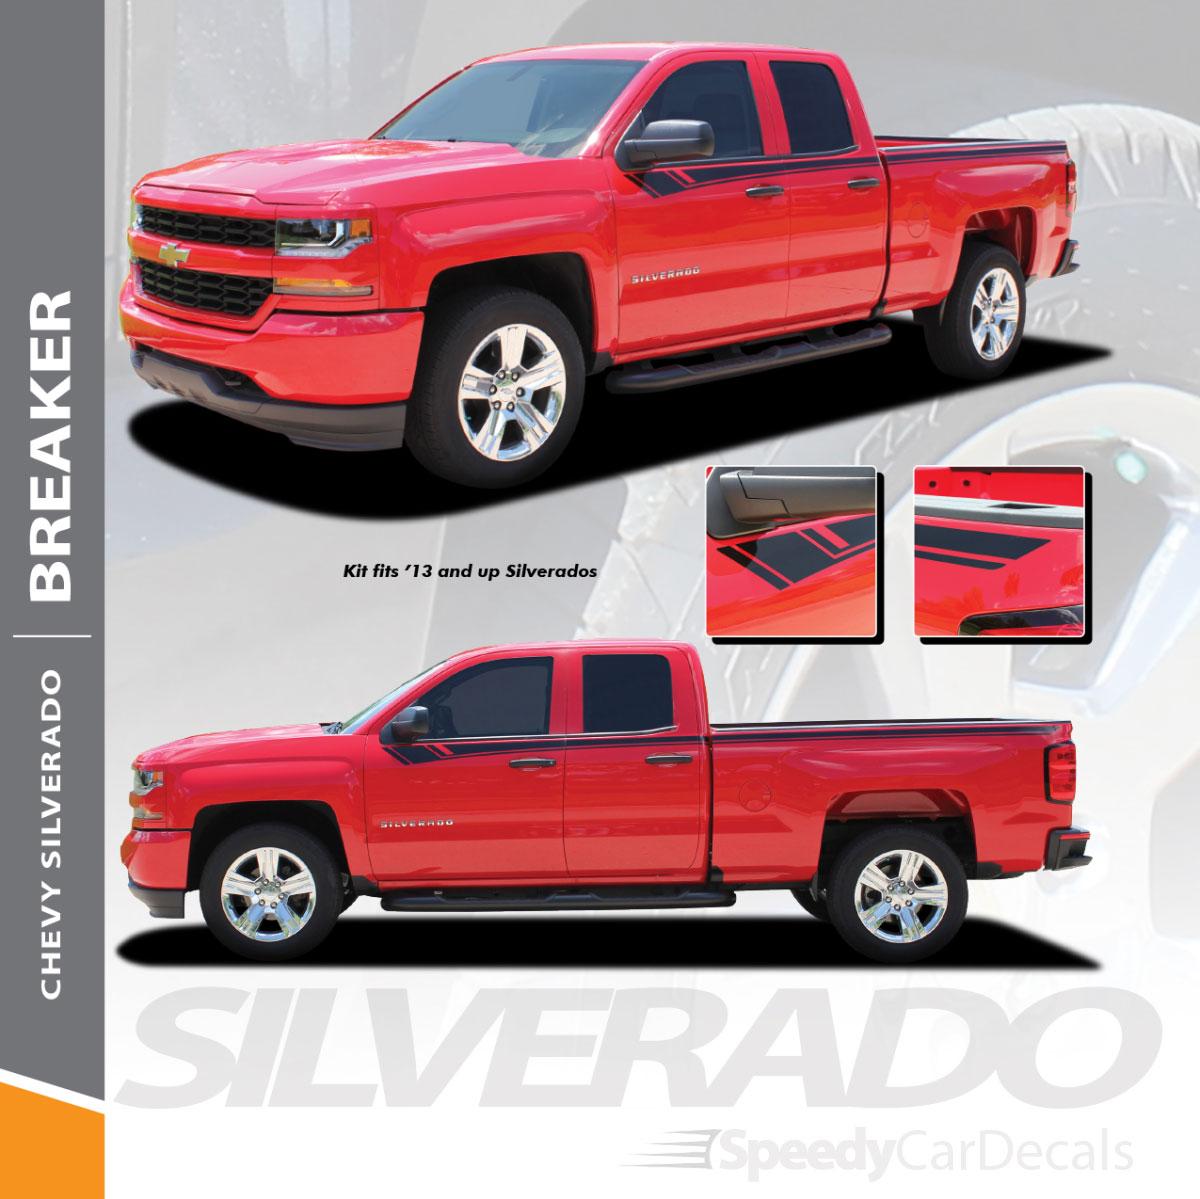 Chevy Silverado Upper Graphics Kit Breaker 3m 2014 2018 Wet And Dry